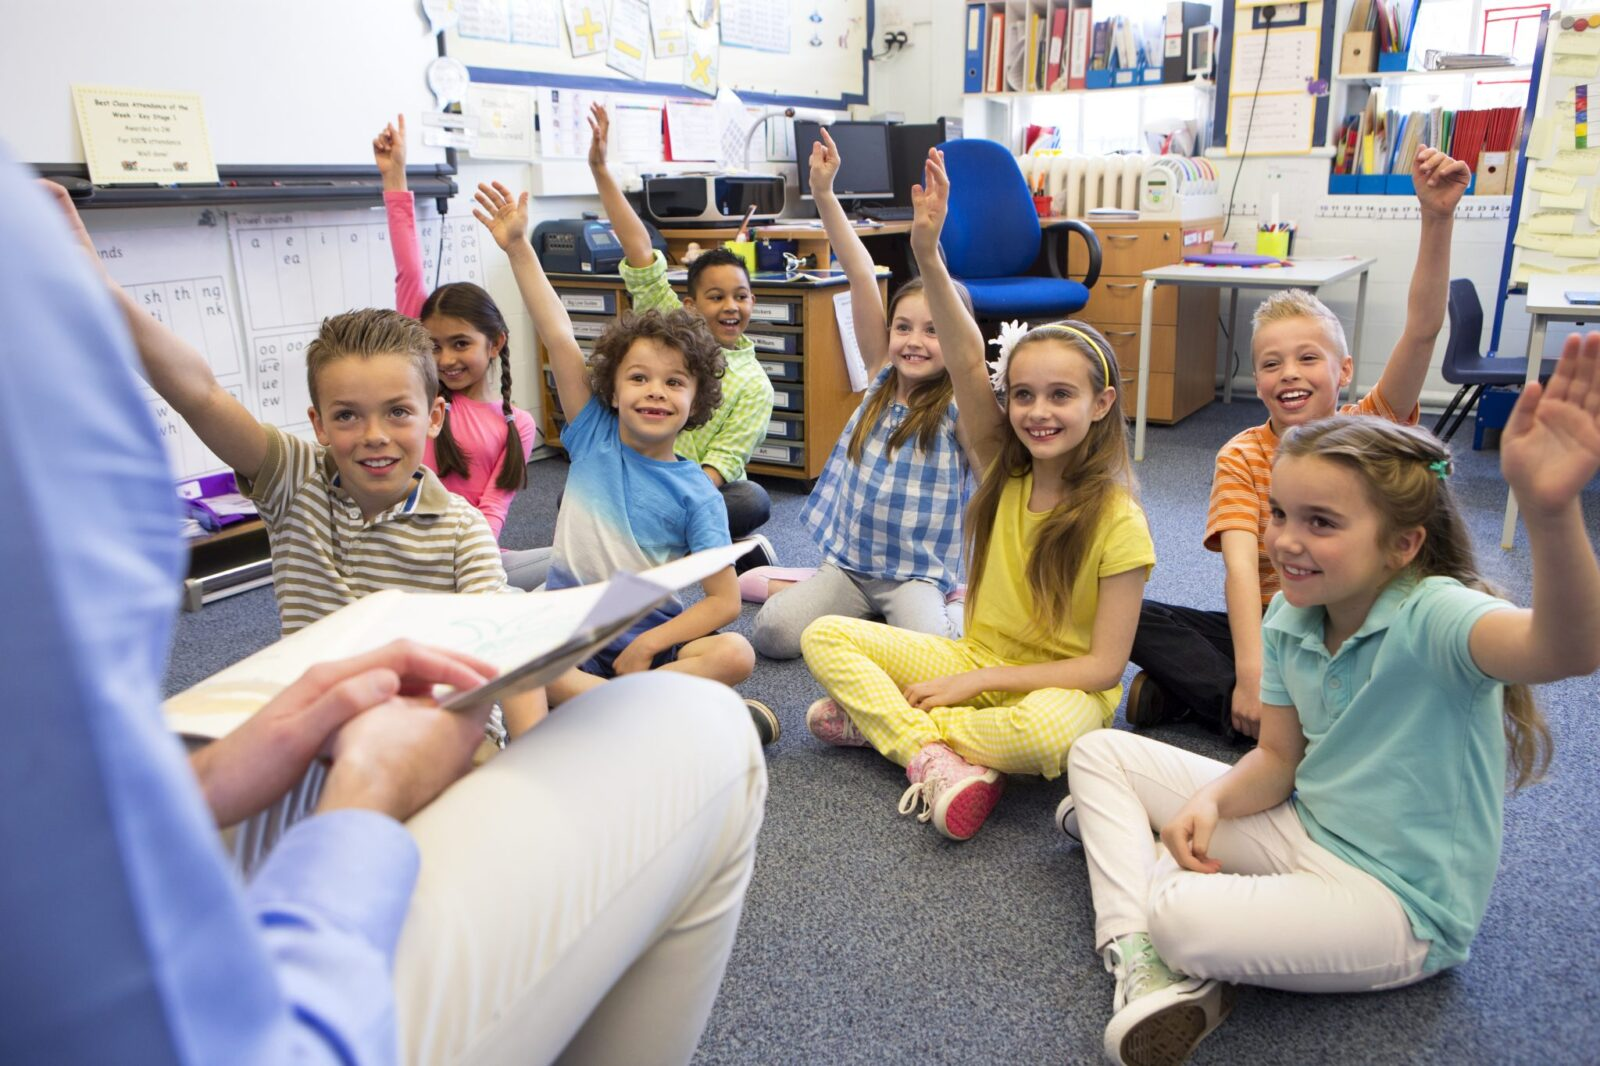 Teaching Listening Skills In The Classroom